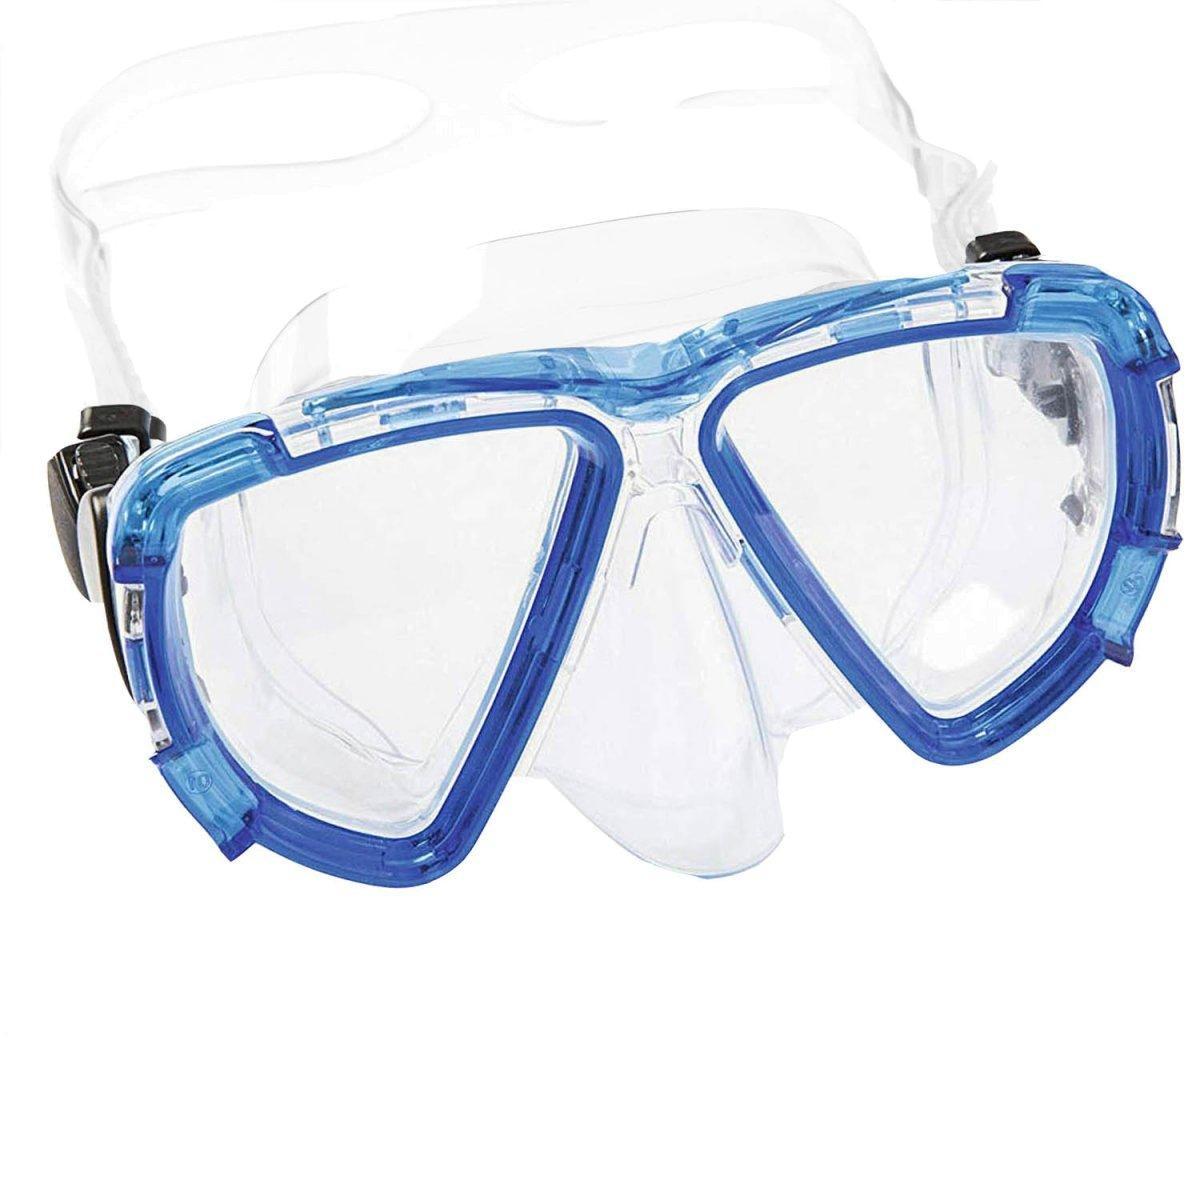 Маска для плавания Bestway 22052, размер XL, (10+), обхват головы ≈ 56 см, синяя